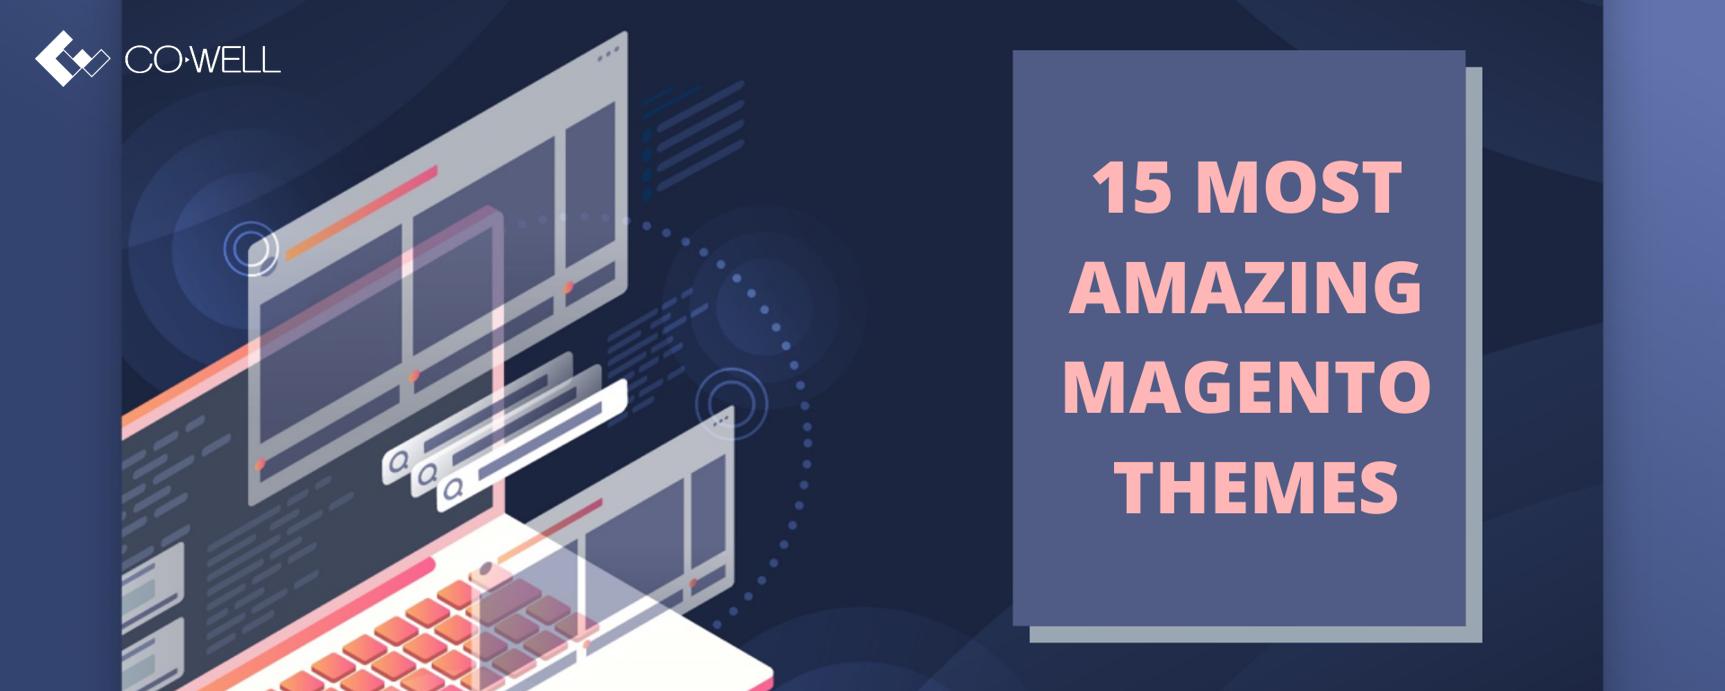 15 most amazing Magento themes